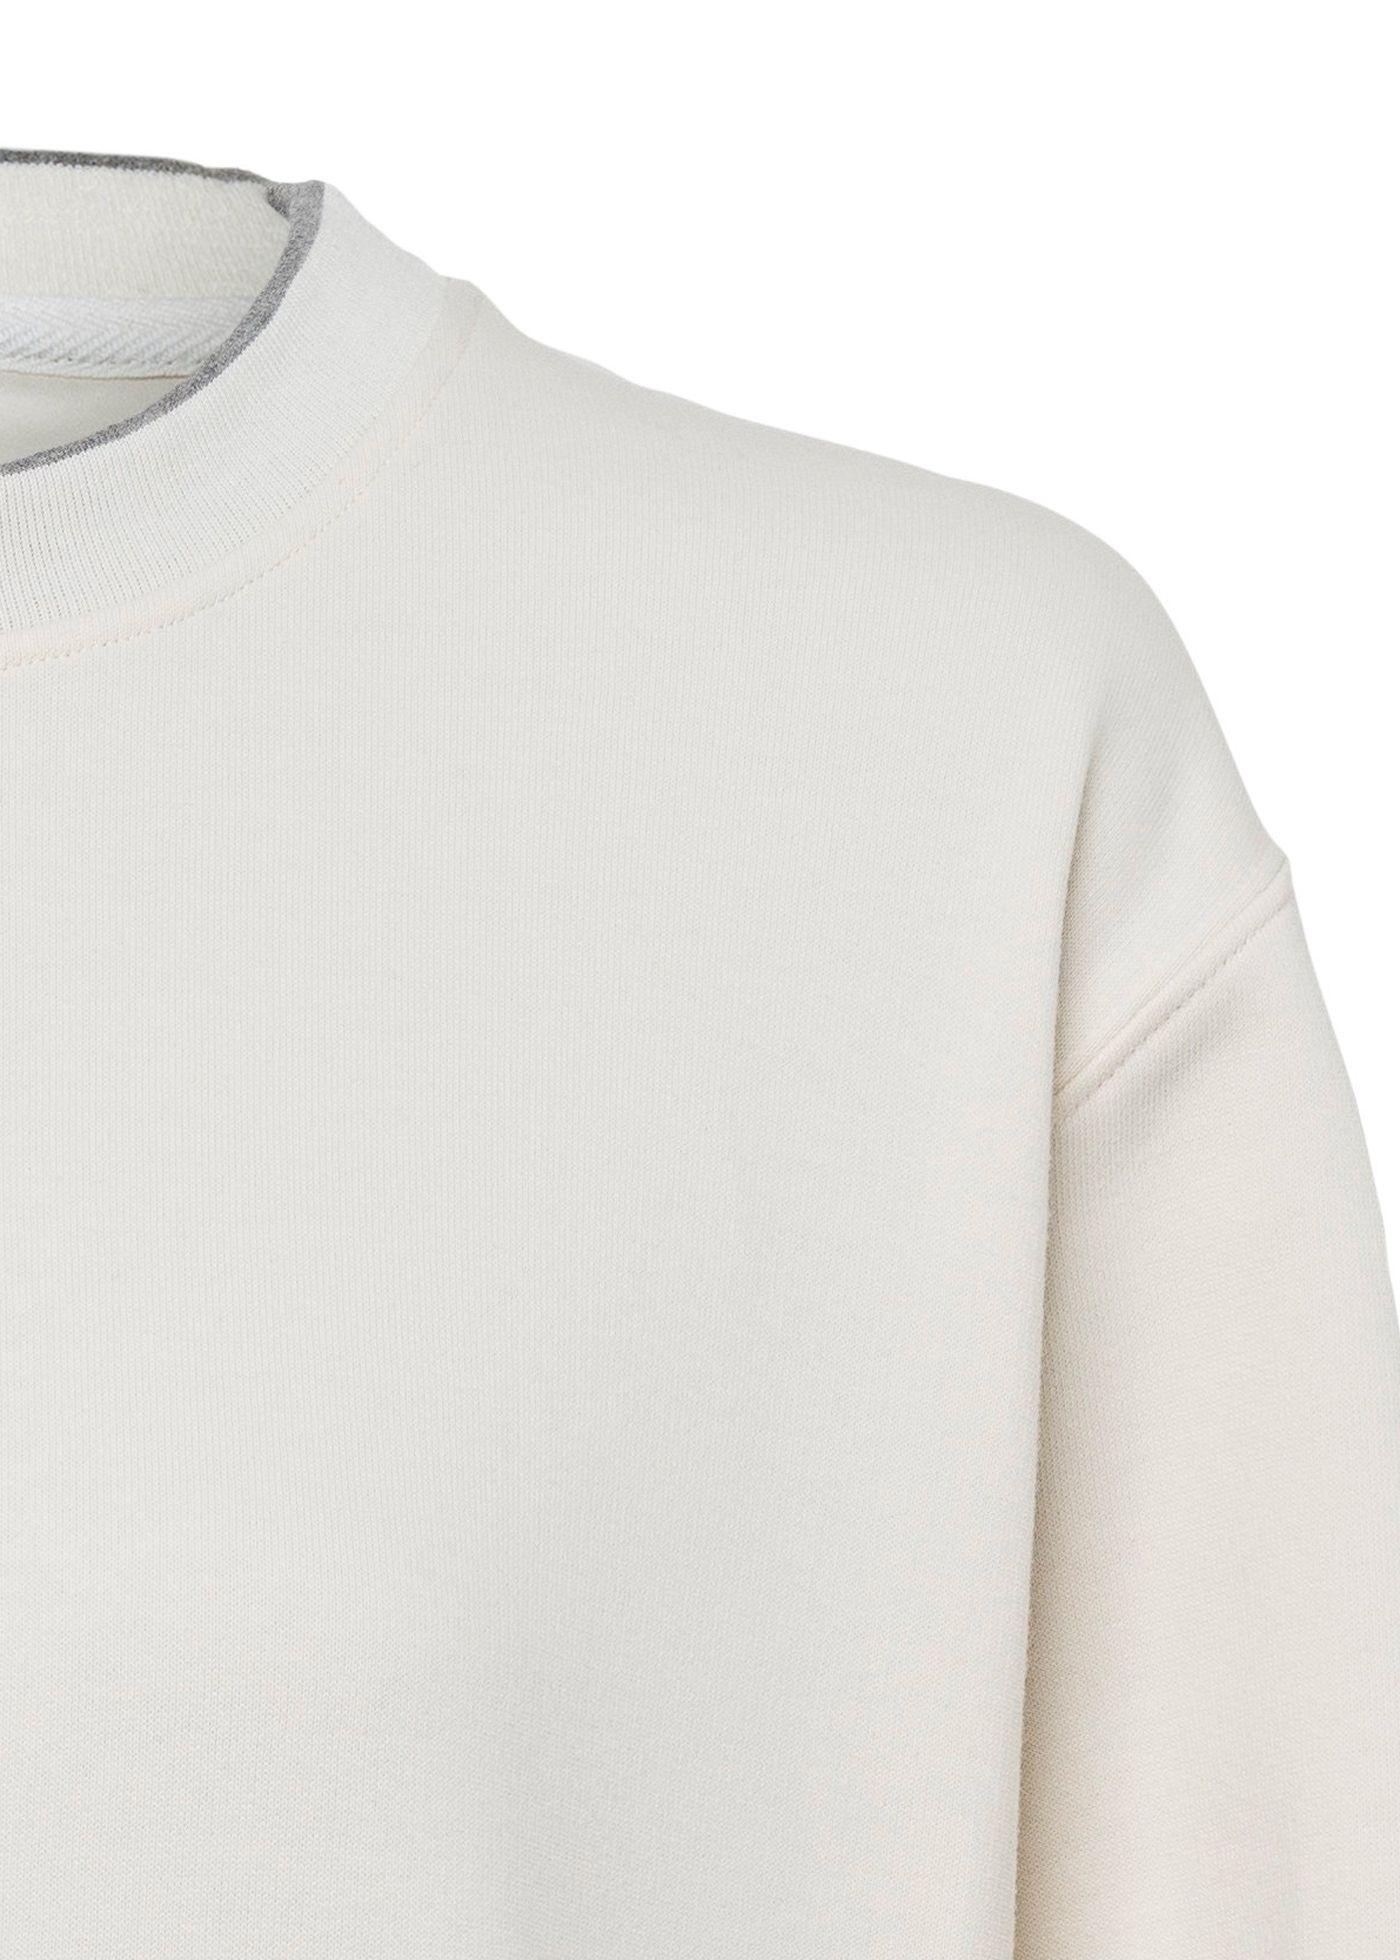 May Organic Sweatshirt image number 2